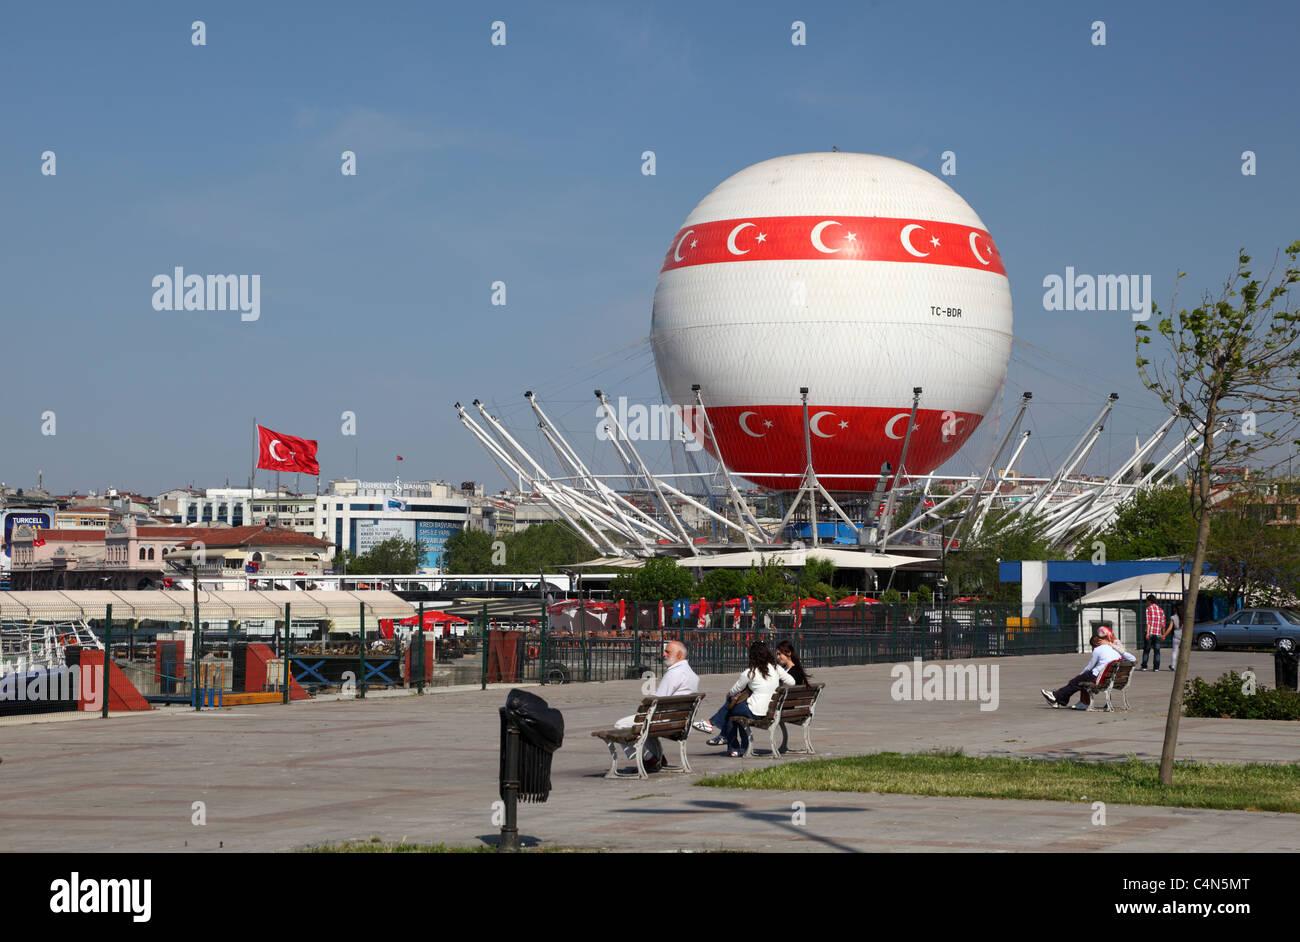 Hot air baloon in Kadikoy, Istanbul Turkey. Photo taken at 24th of Mai 2011 - Stock Image